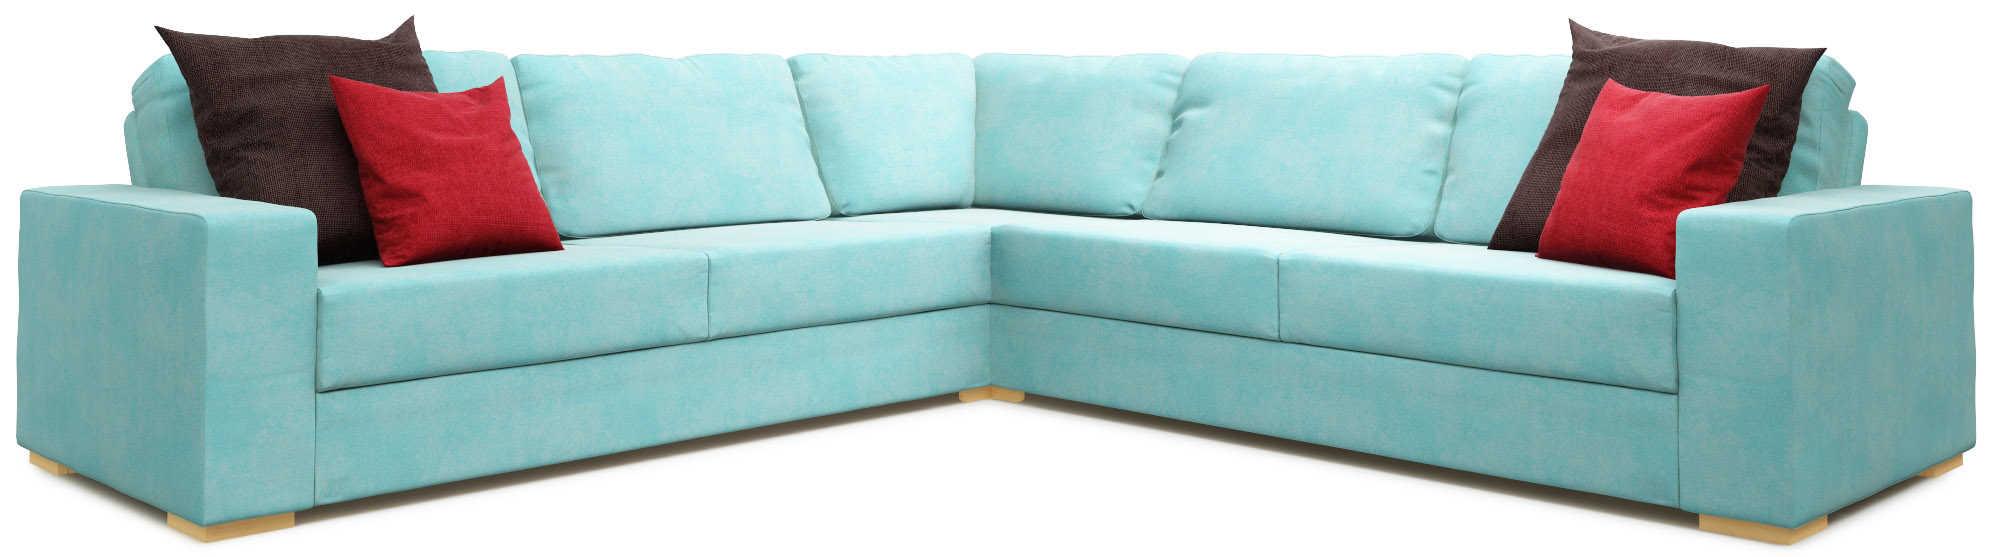 Sui 3X3 Corner Sofa